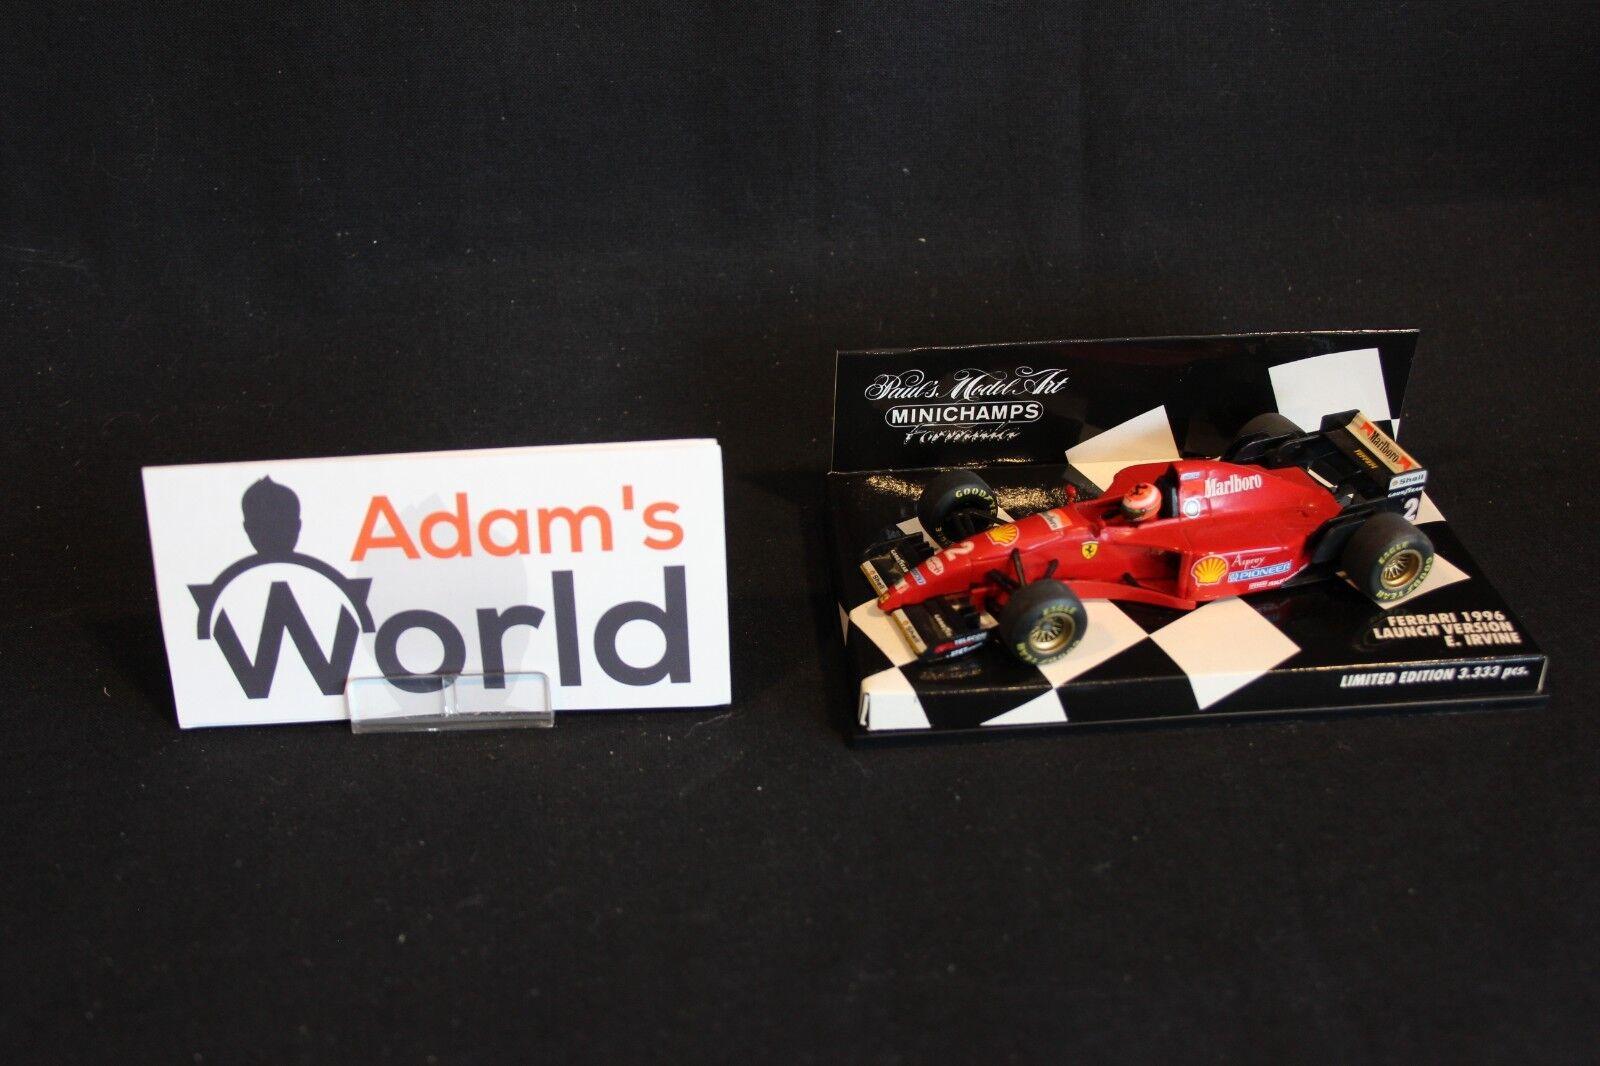 Minichamps Ferrari Launch 1996 1 43 Eddie Irvine (GBR) (MM1) Marlboro